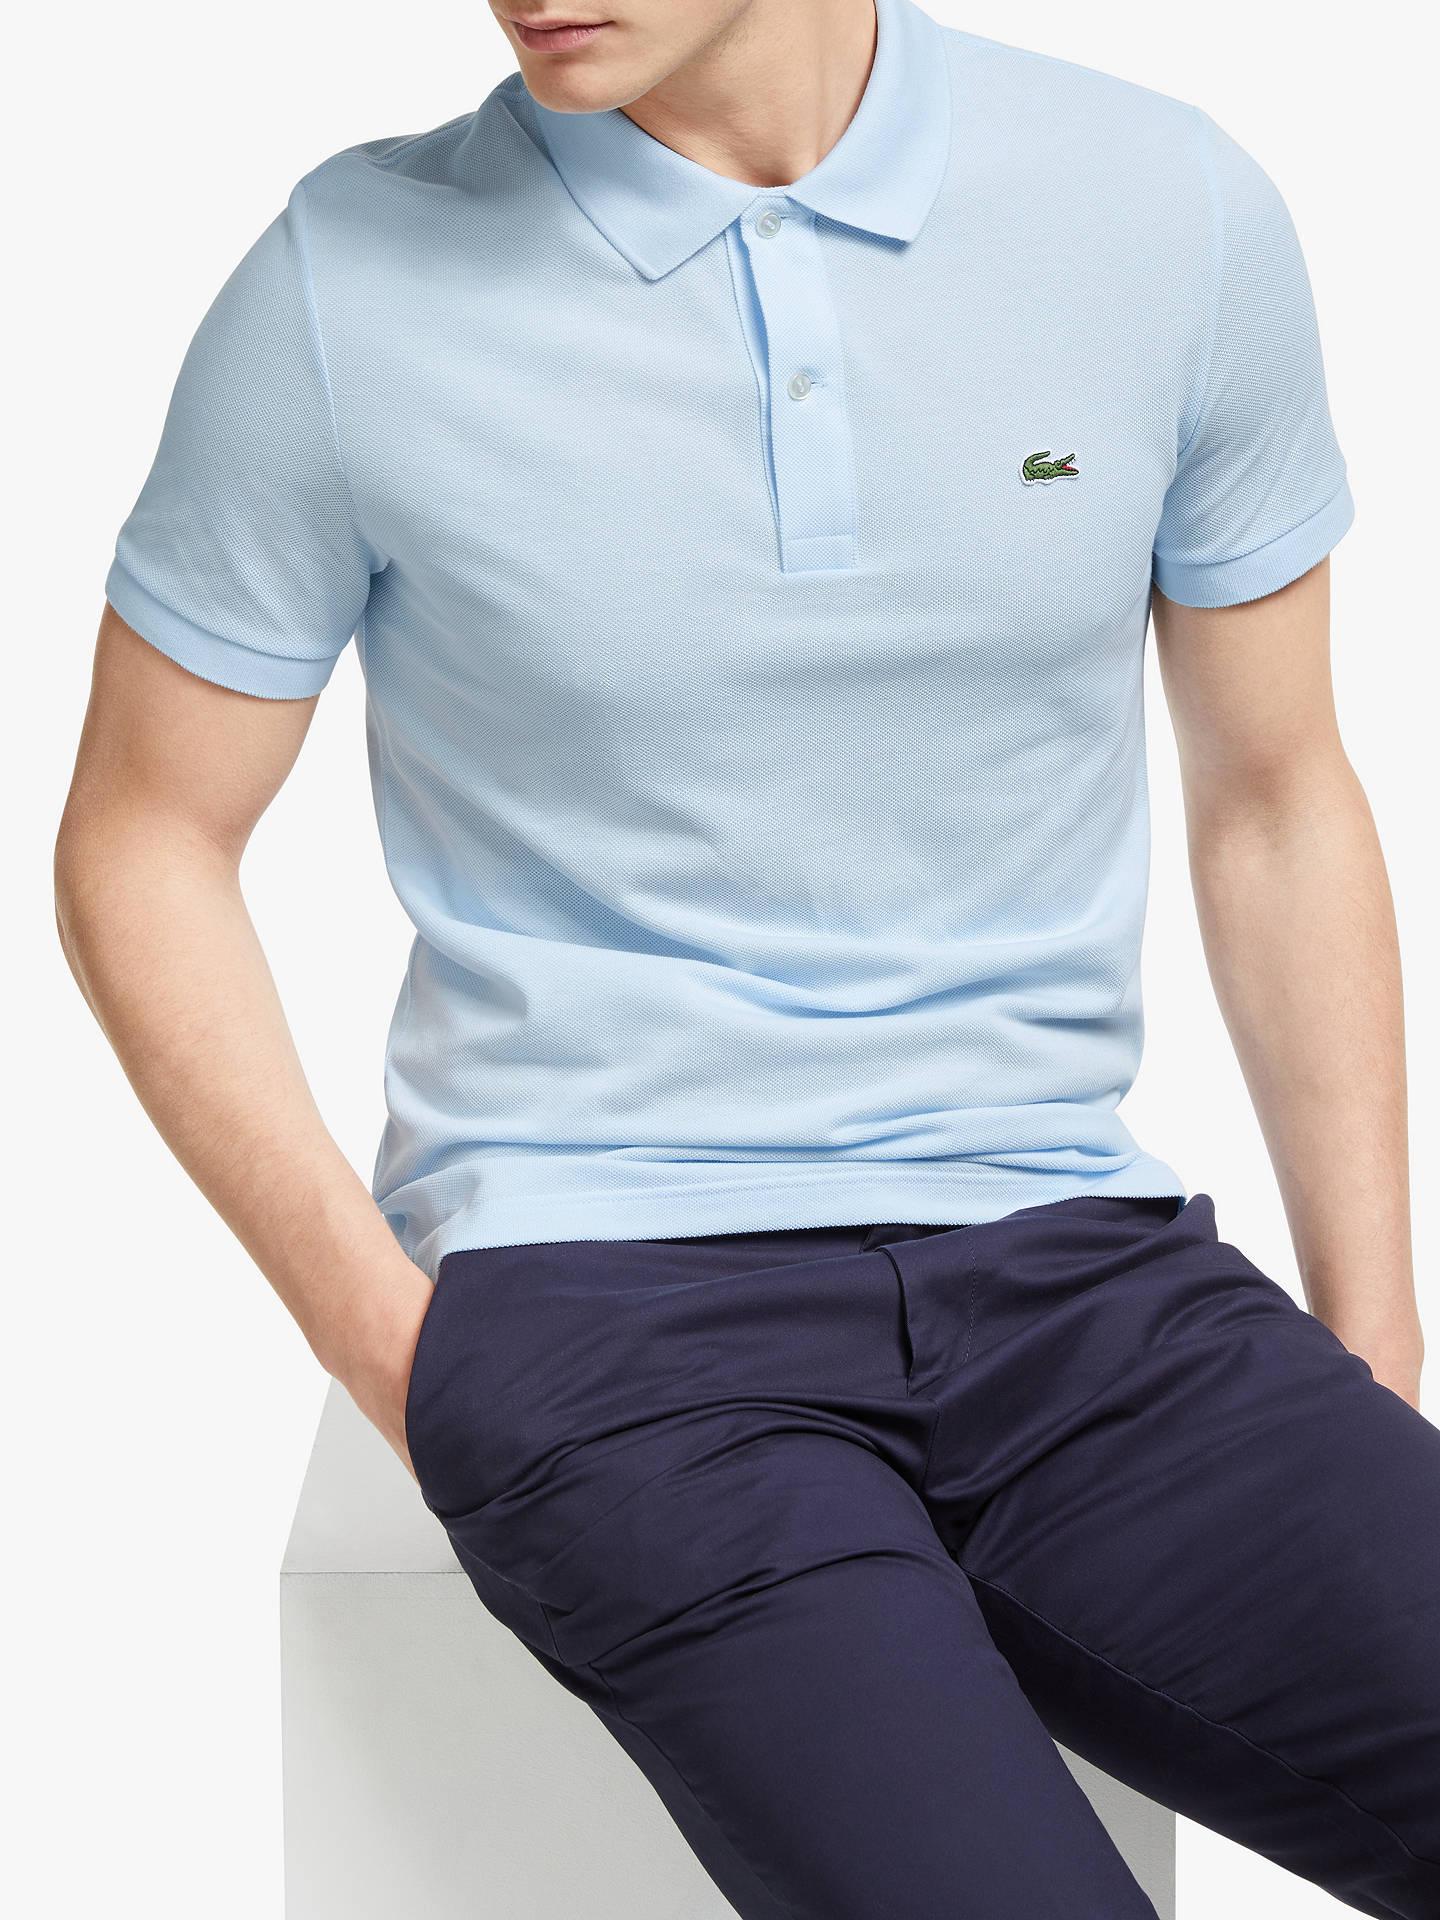 ce395ccea1 Lacoste Classic Slim Fit Short Sleeve Polo Shirt, Ruisseau